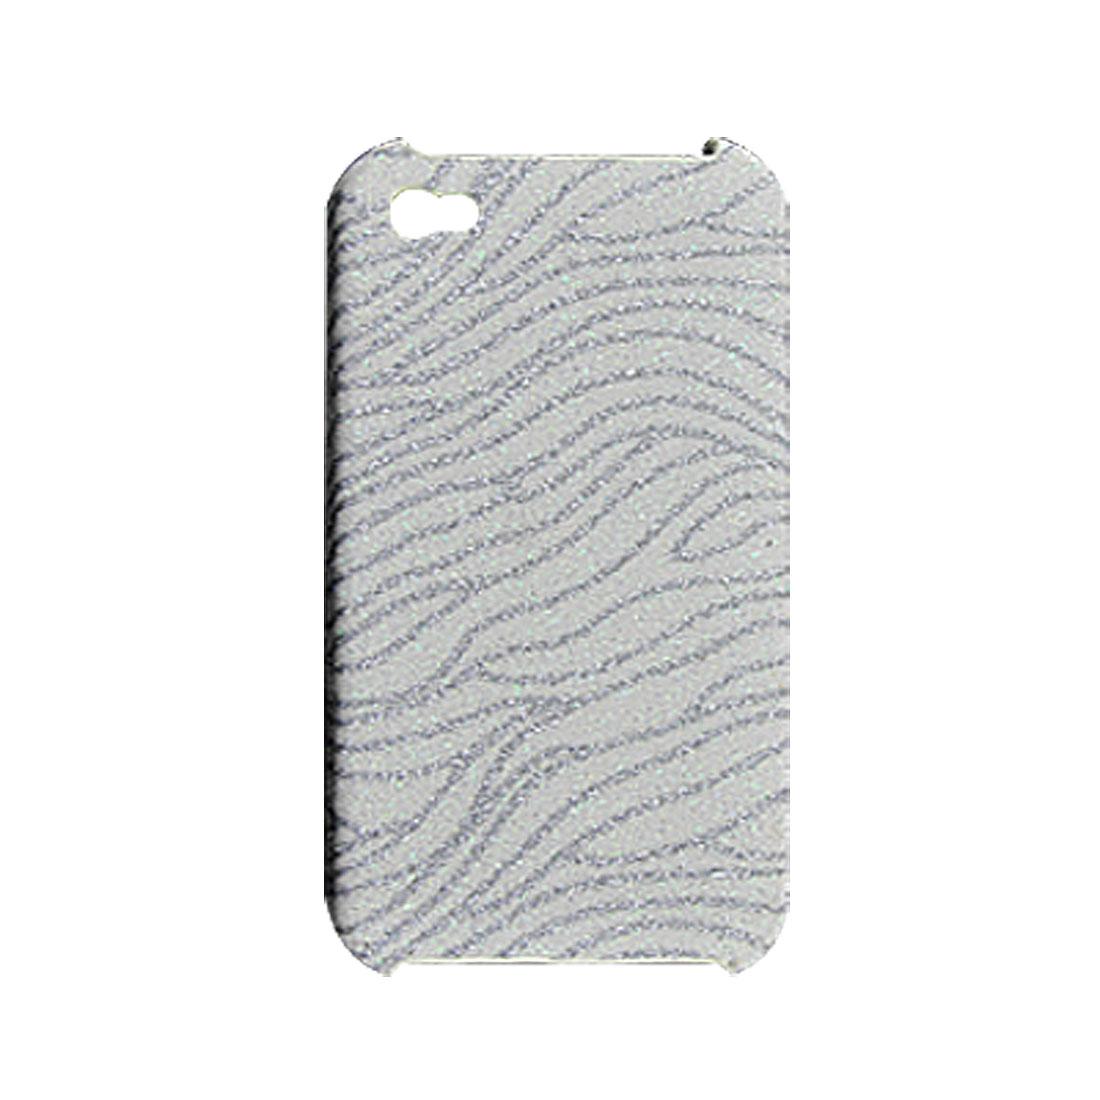 Skidproof Glittery Zebra Print White Silver Tone Hard Case for iPhone 4 4G